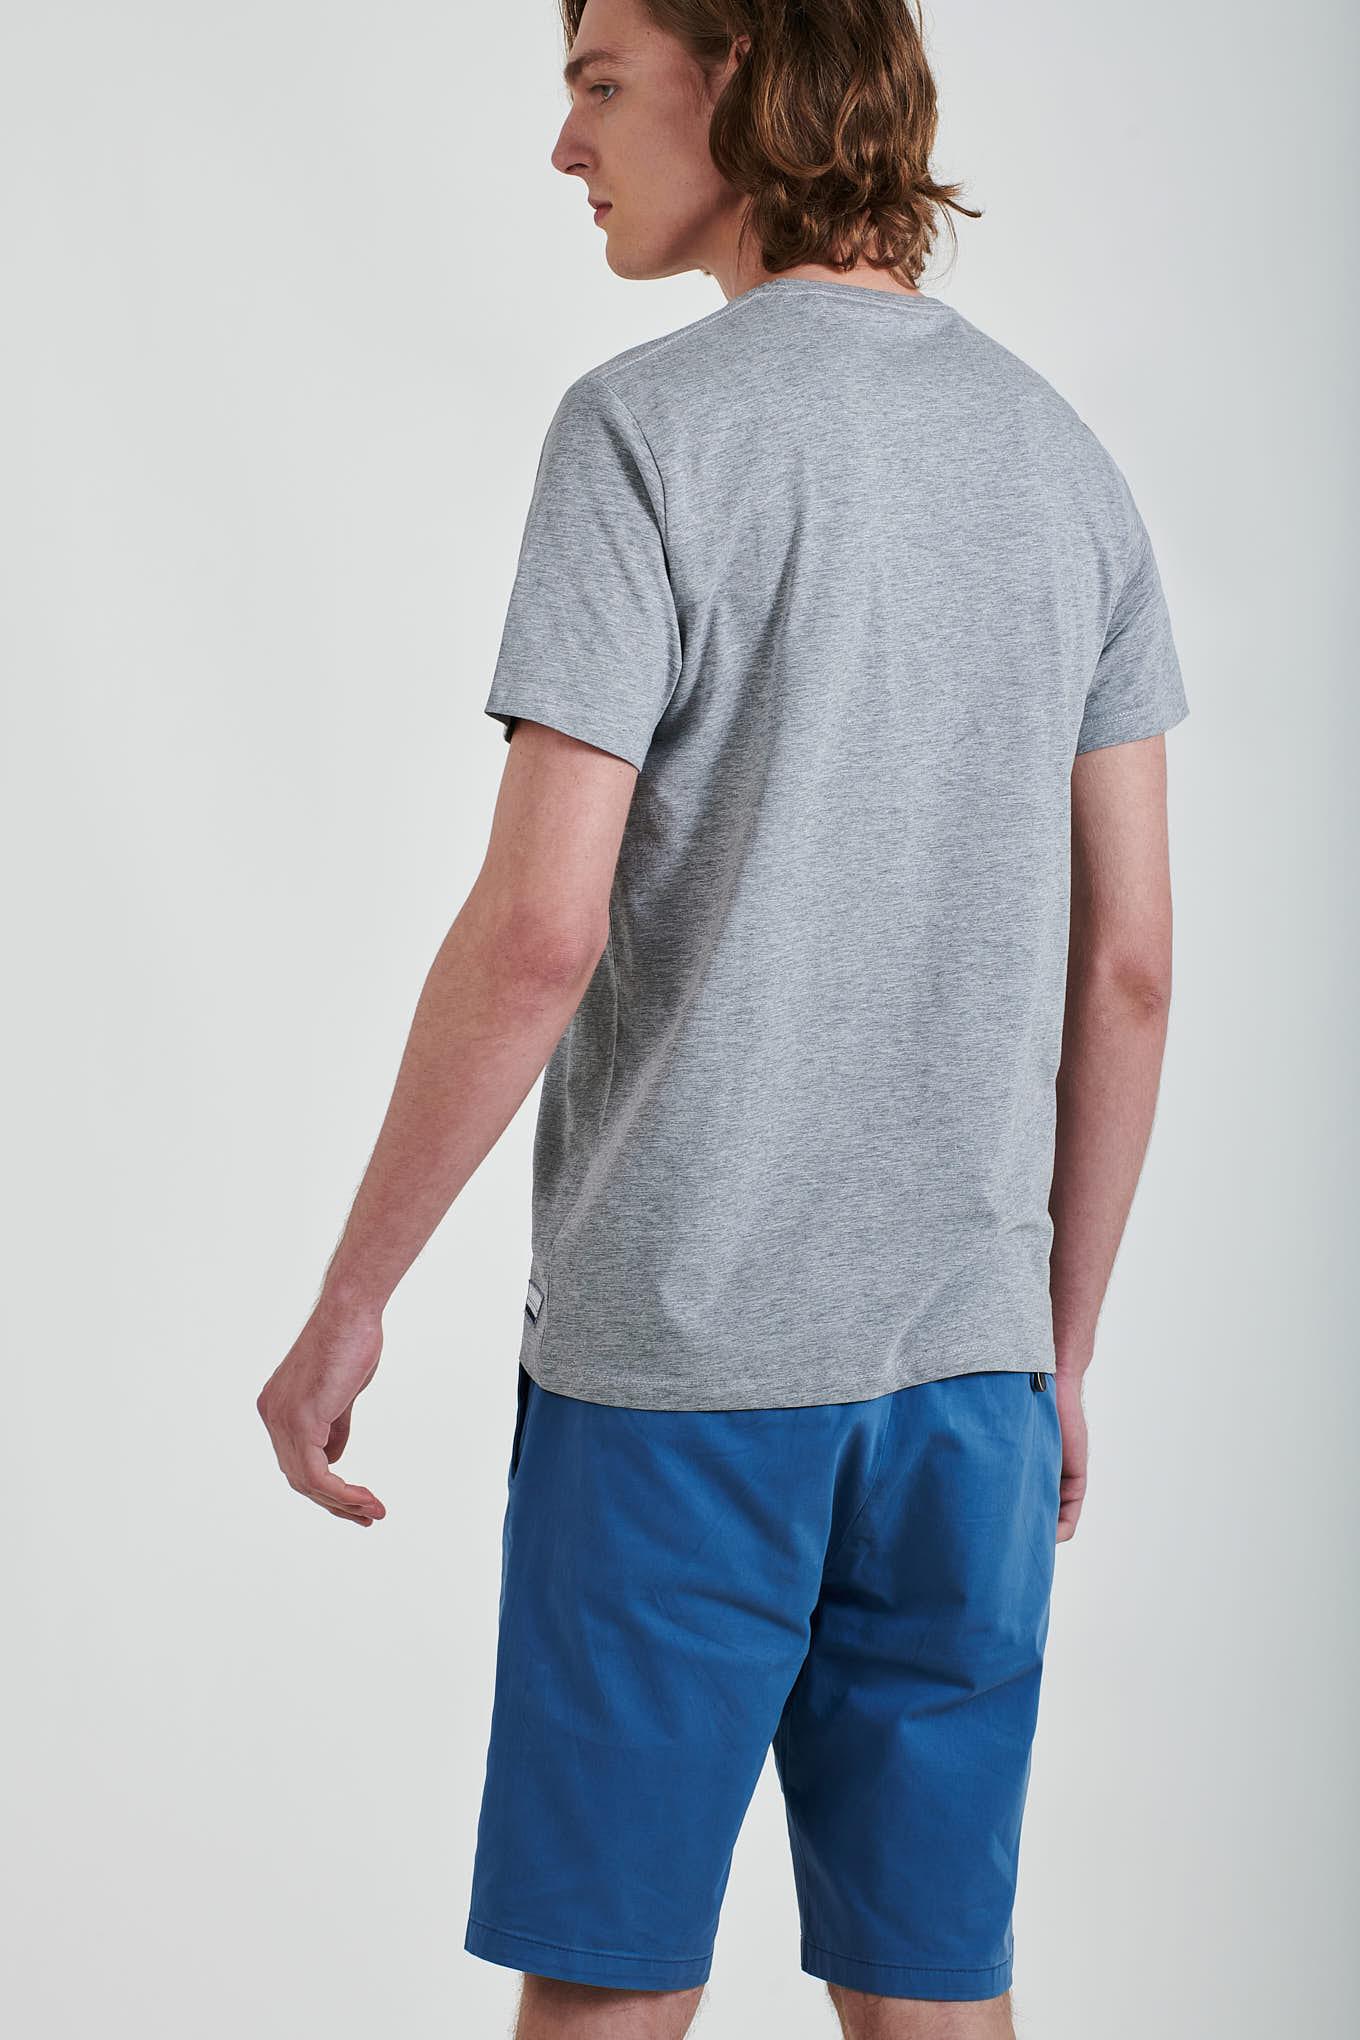 T-Shirt Cinza Claro Sport Homem